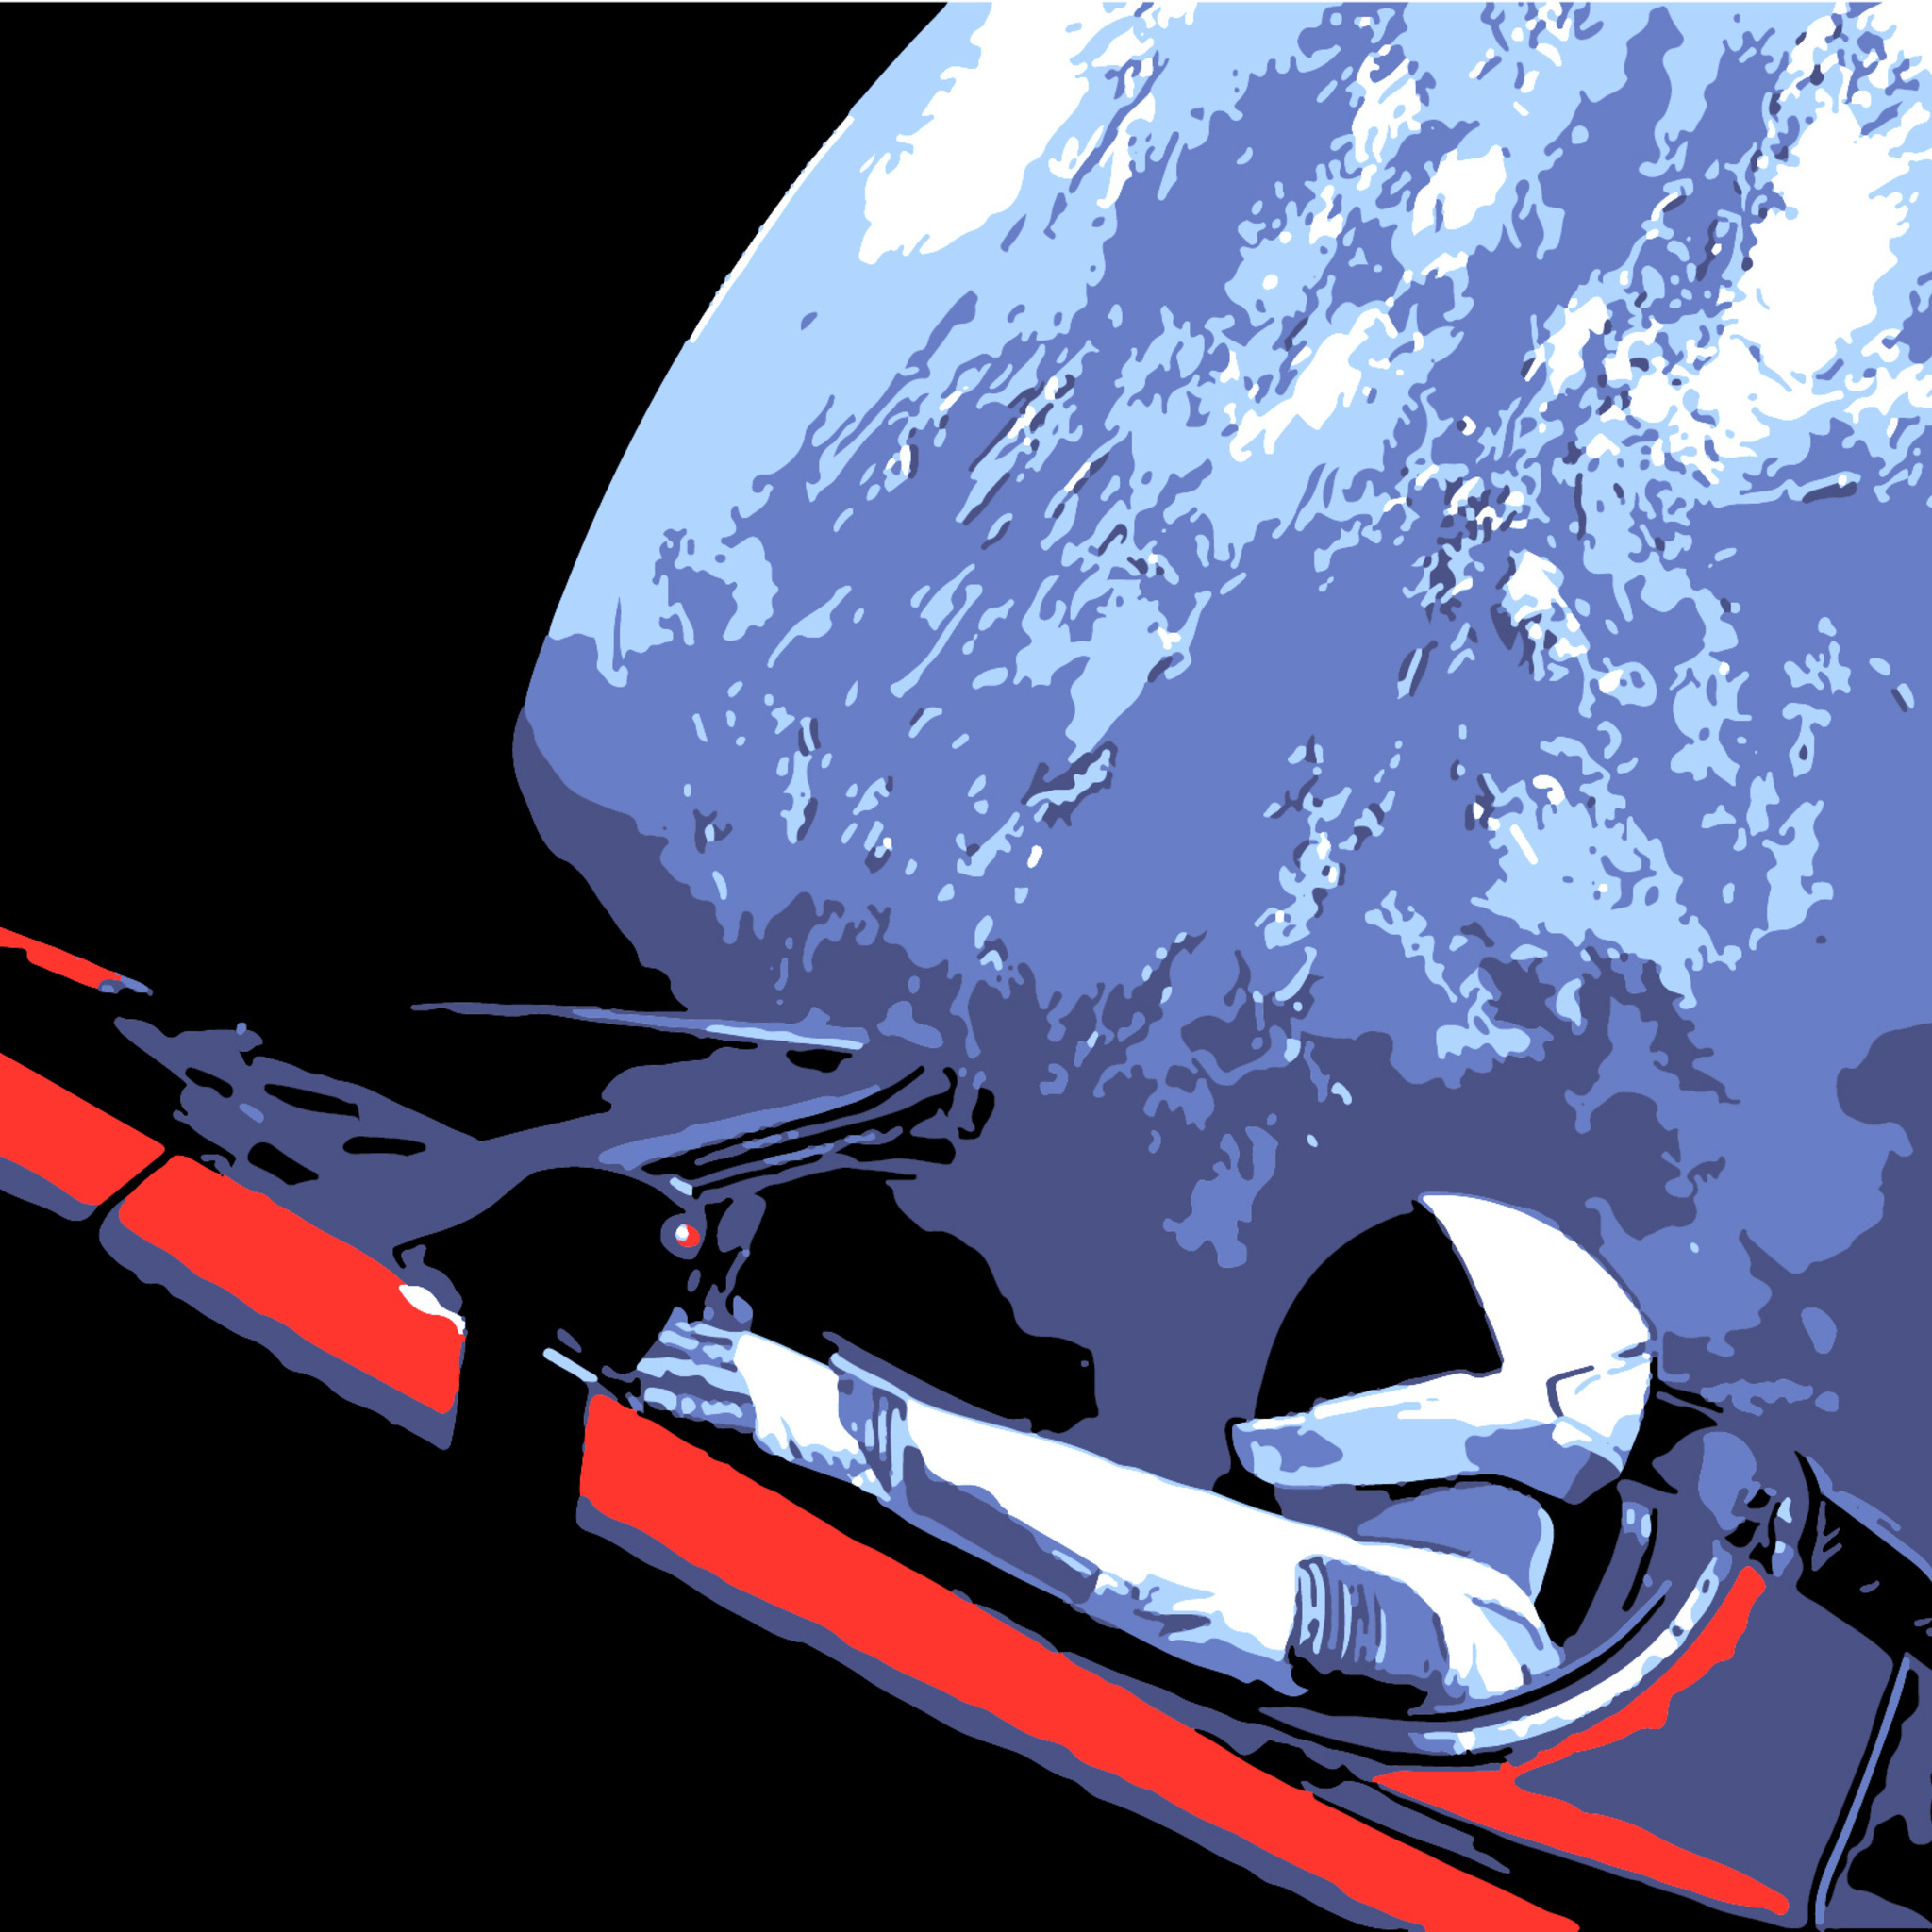 2048x2048 Tesla Roadster Space X Ipad Air HD 4k Wallpapers